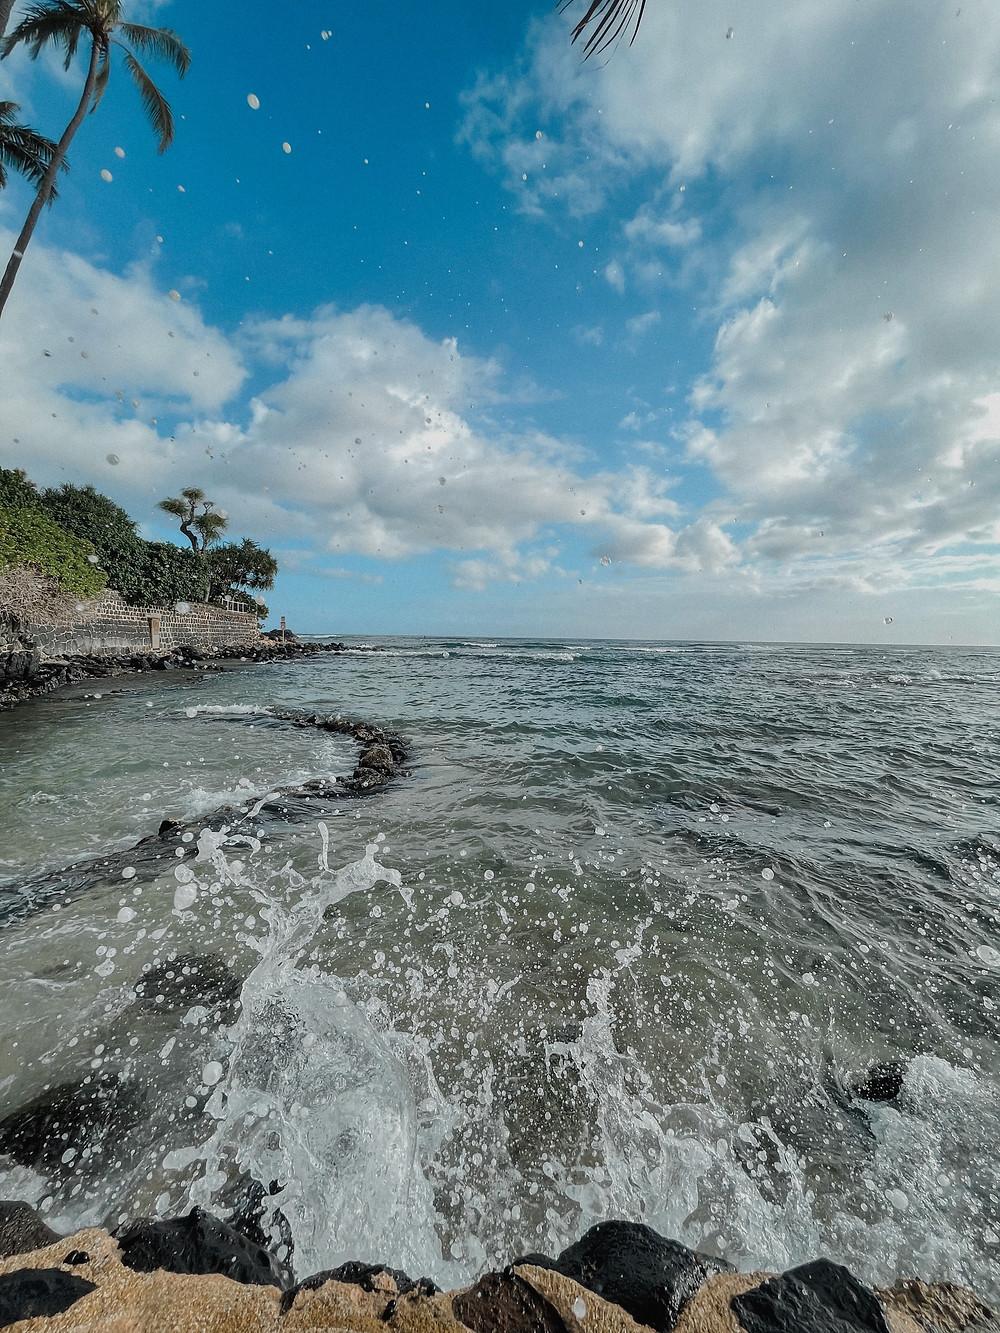 oahu, hawaii travel itinerary